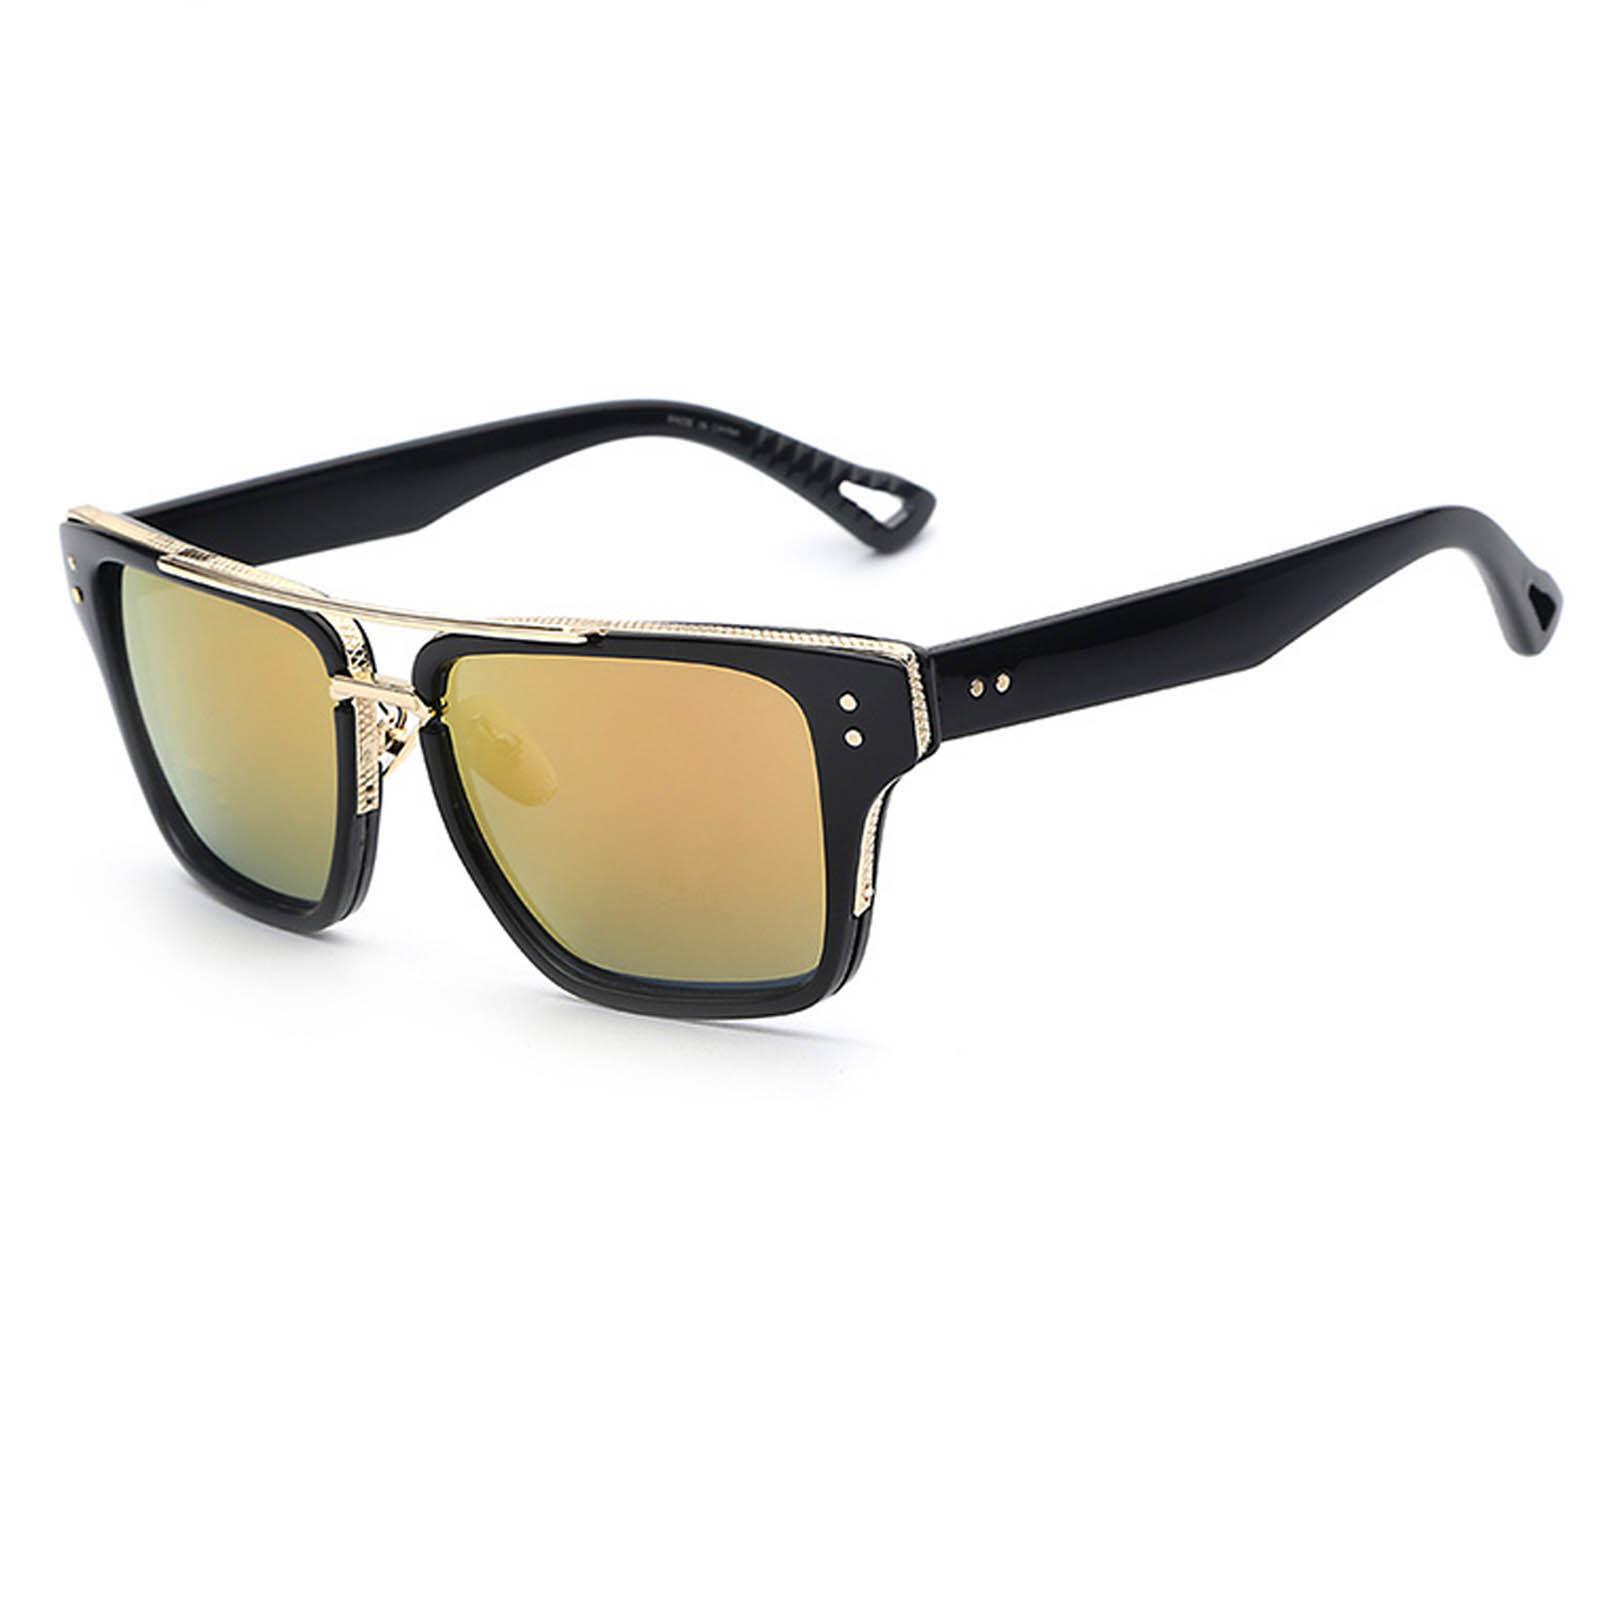 OWL ® 026 C2 Rectangle Eyewear Sunglasses Women\'s Men\'s Plastic ...